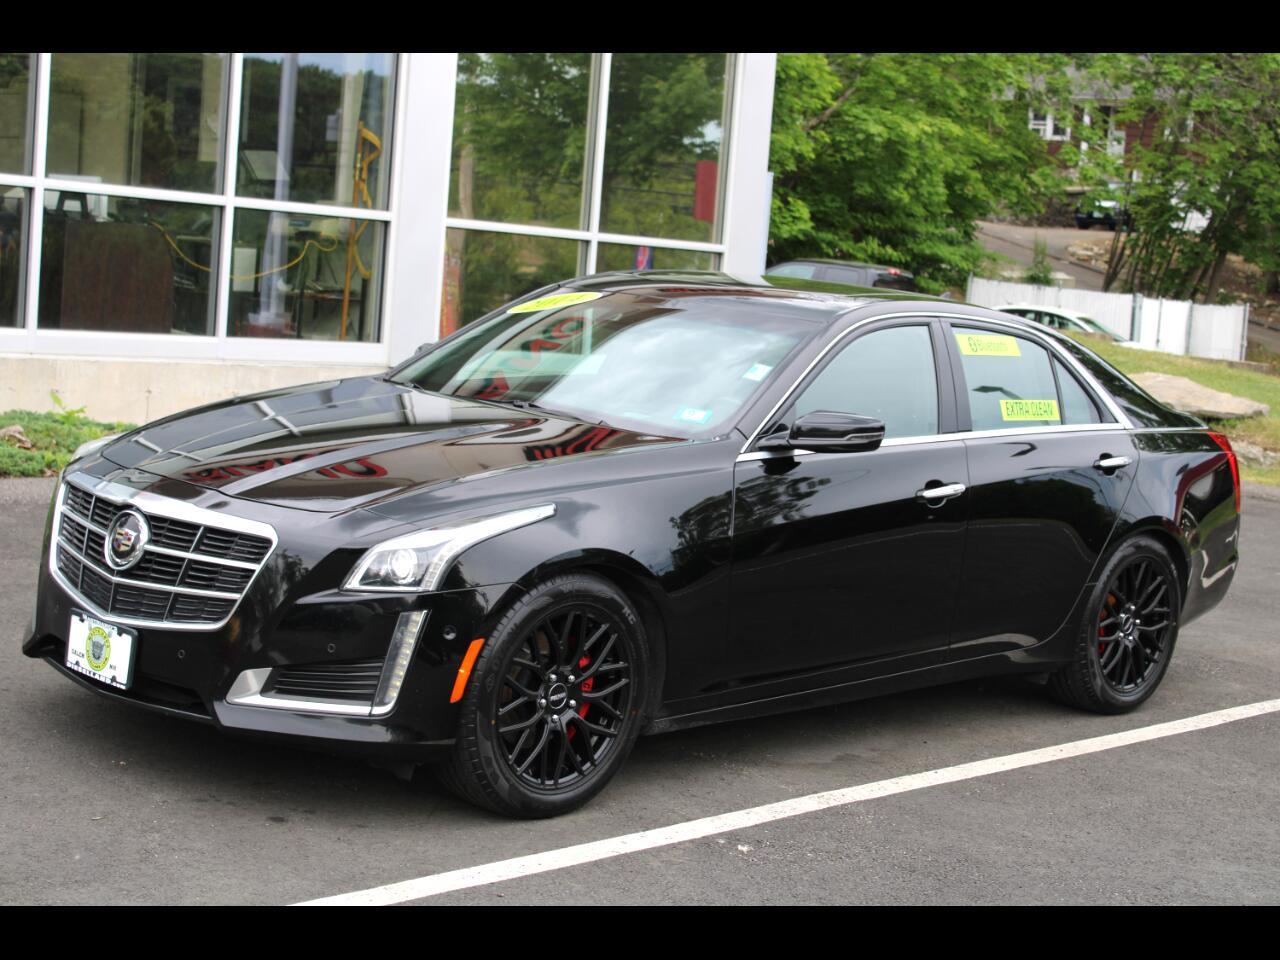 Cadillac CTS Sedan 4dr Sdn 3.6L Premium AWD 2014